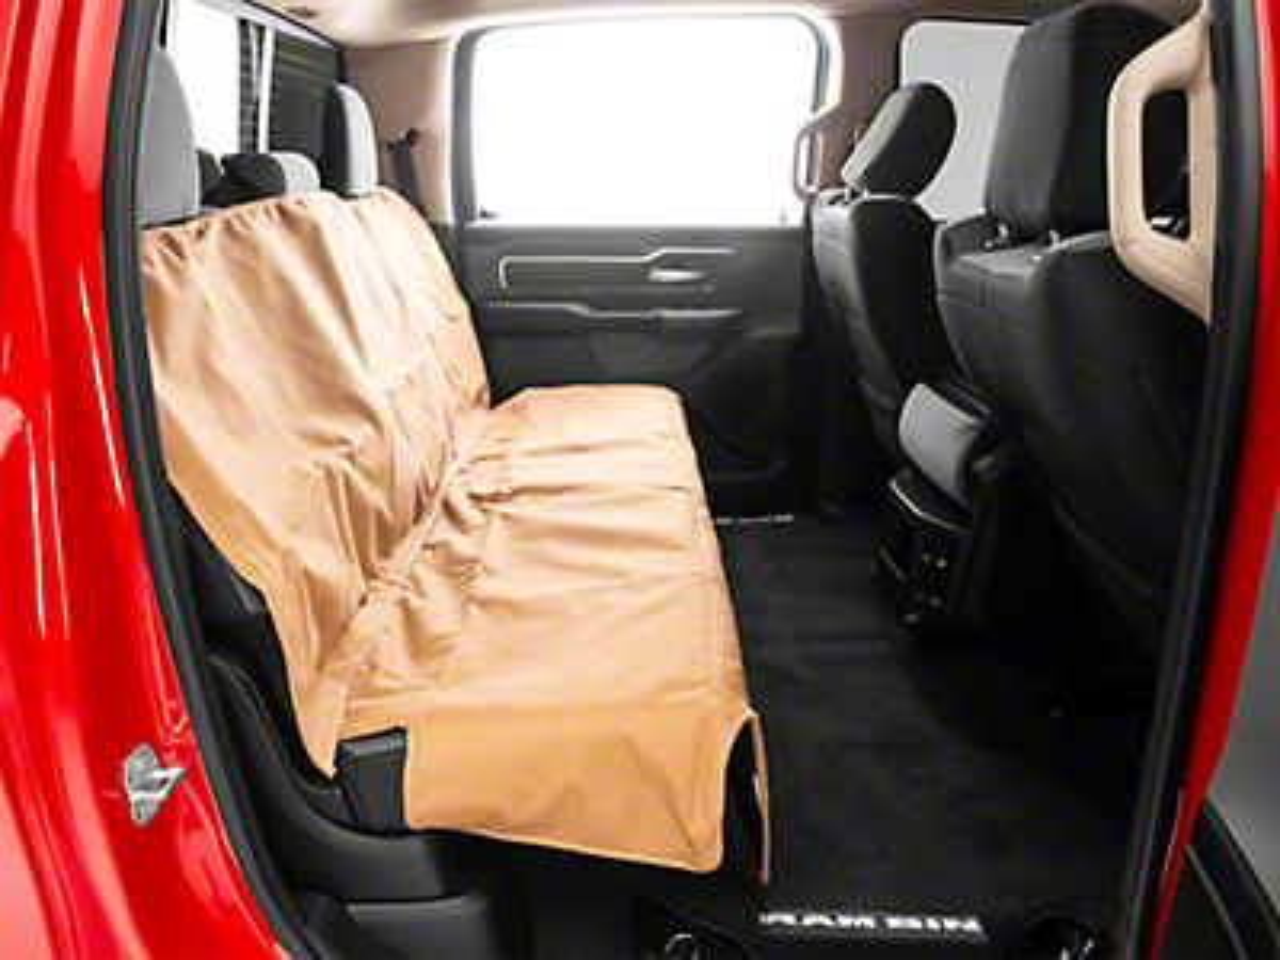 Weathertech 2nd Seat Protector - Tan (09-19 RAM 1500 Crew Cab)